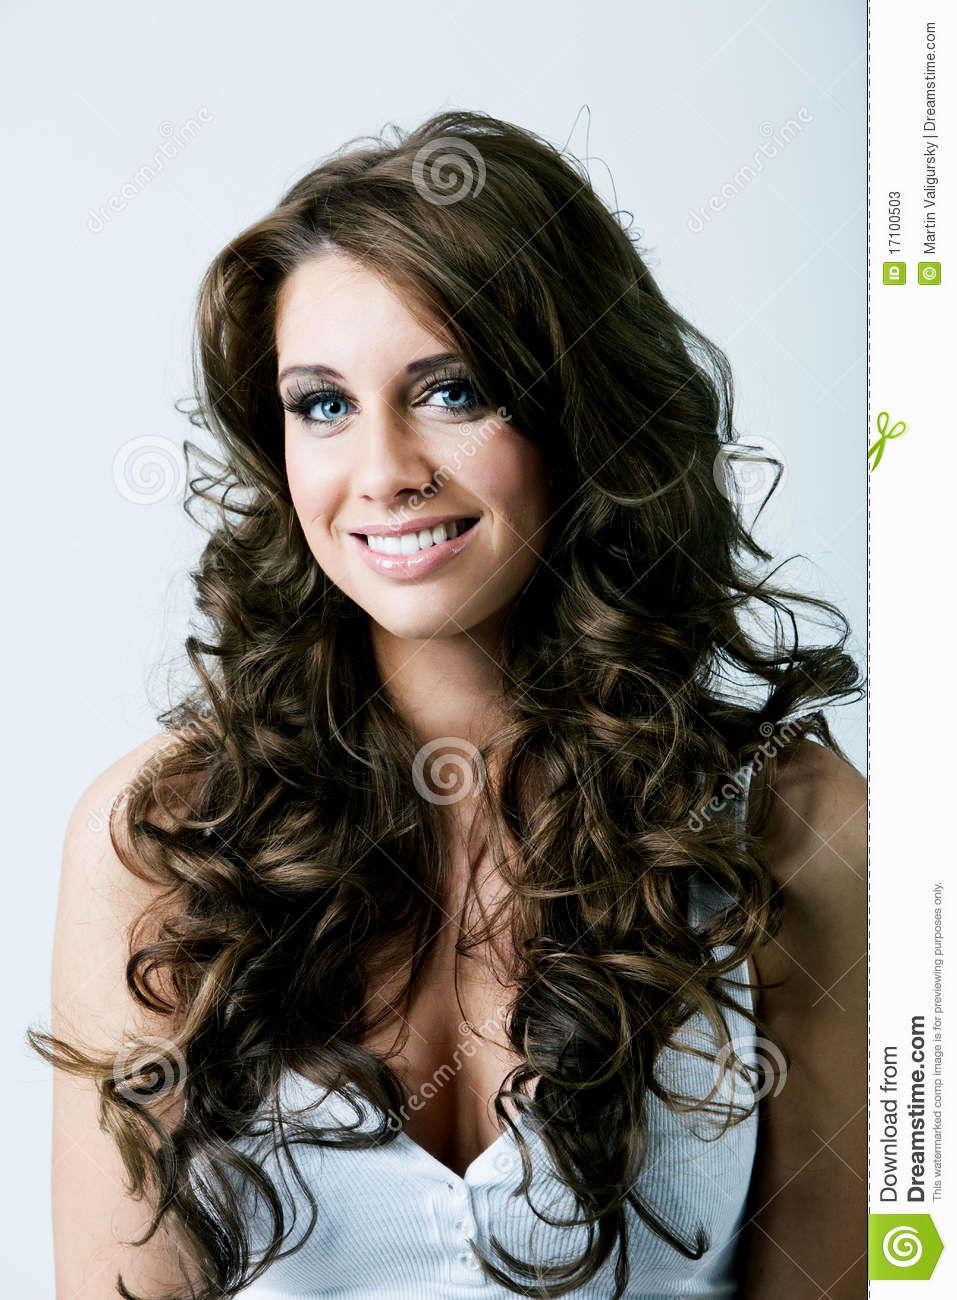 lovely cortes de cabelo longo retrato-Inspirational Cortes De Cabelo Longo Retrato